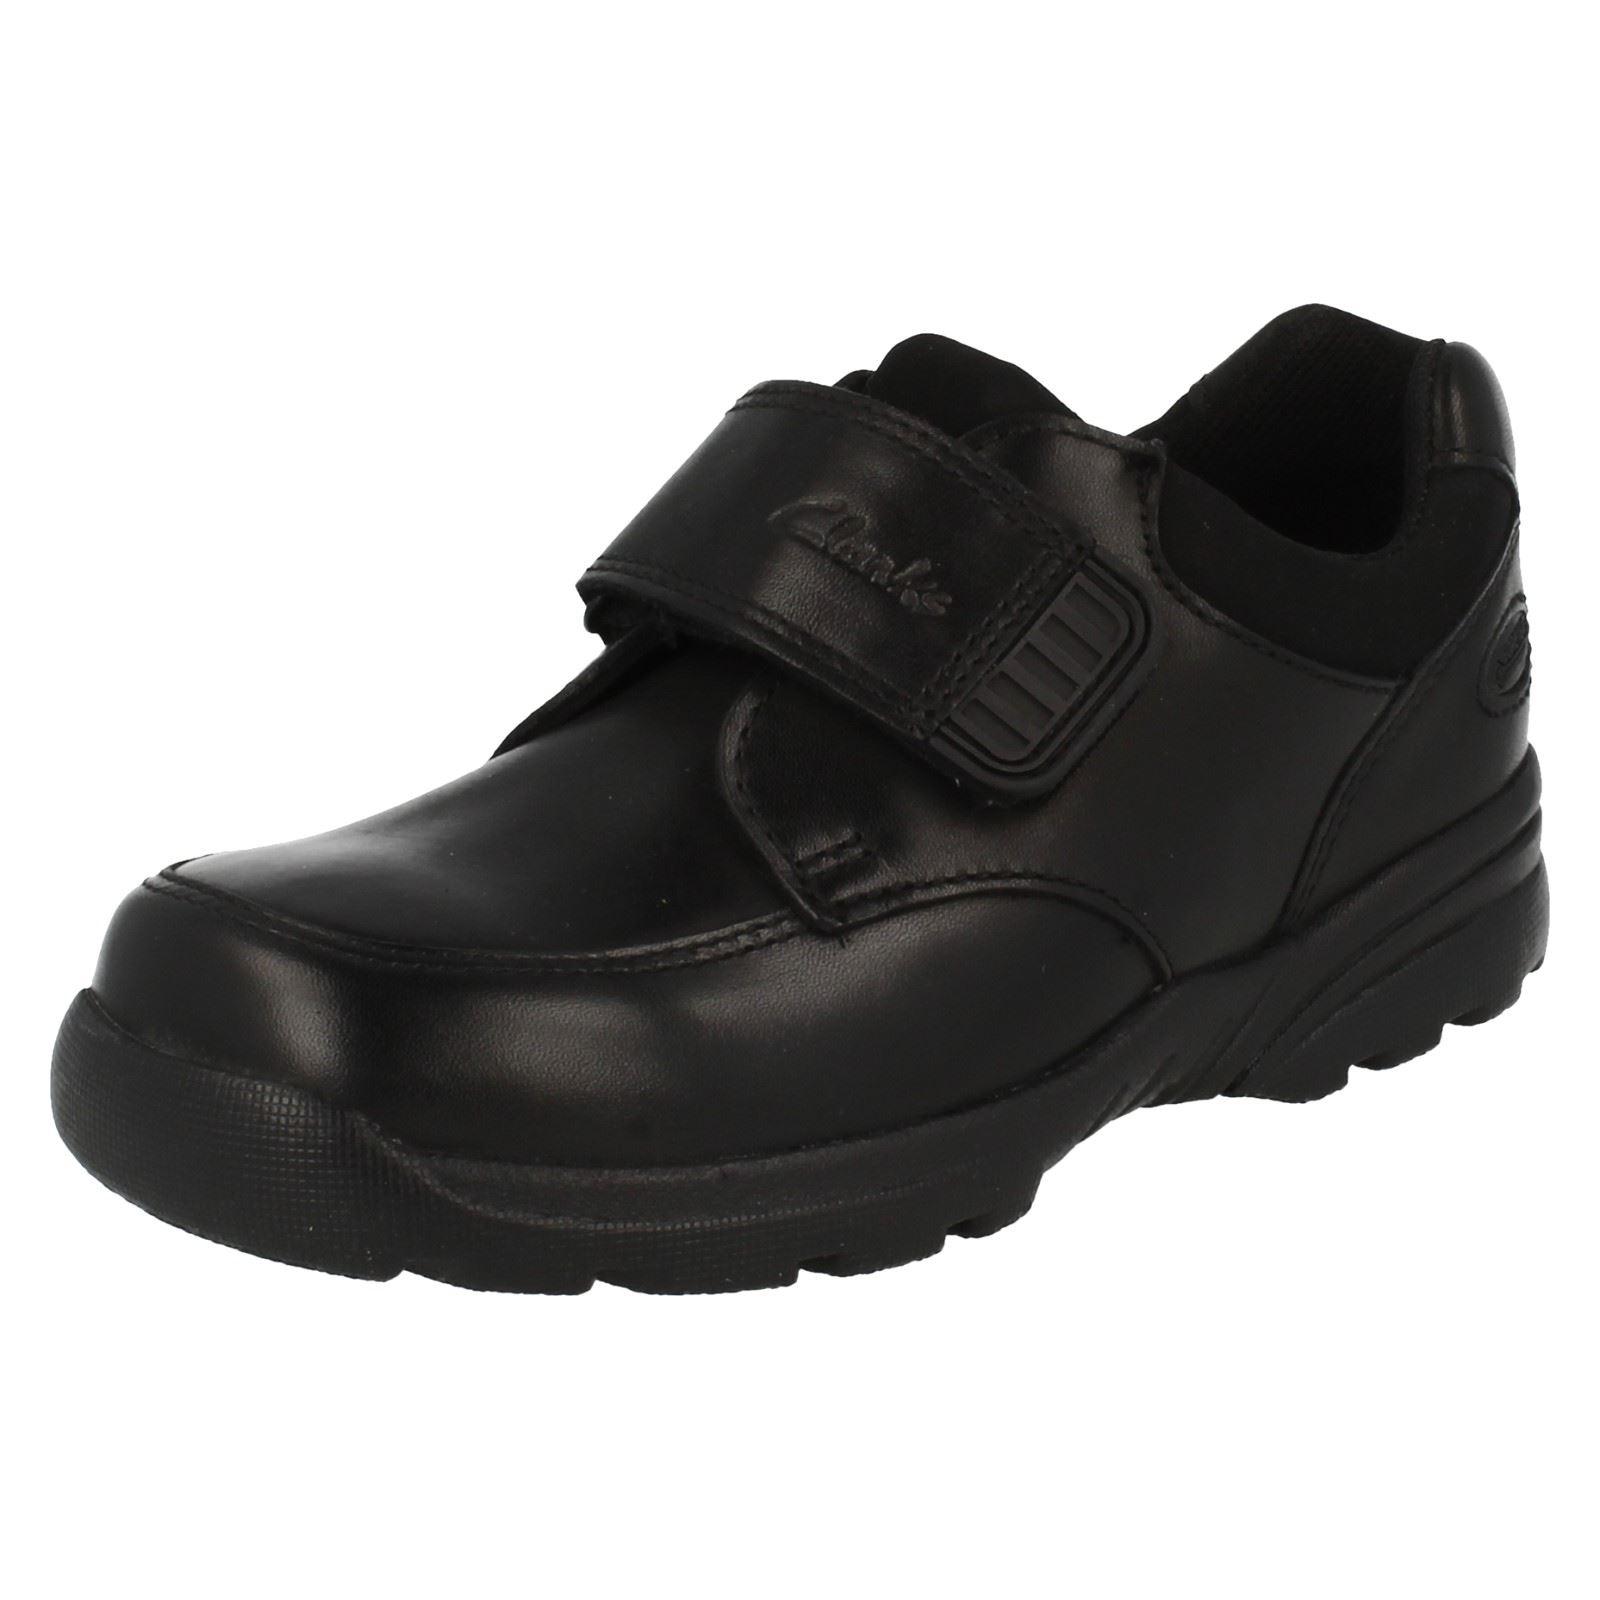 a3a17e818d5b2 Clarks Boys Gore-Tex School Shoes - Tam Go GTX